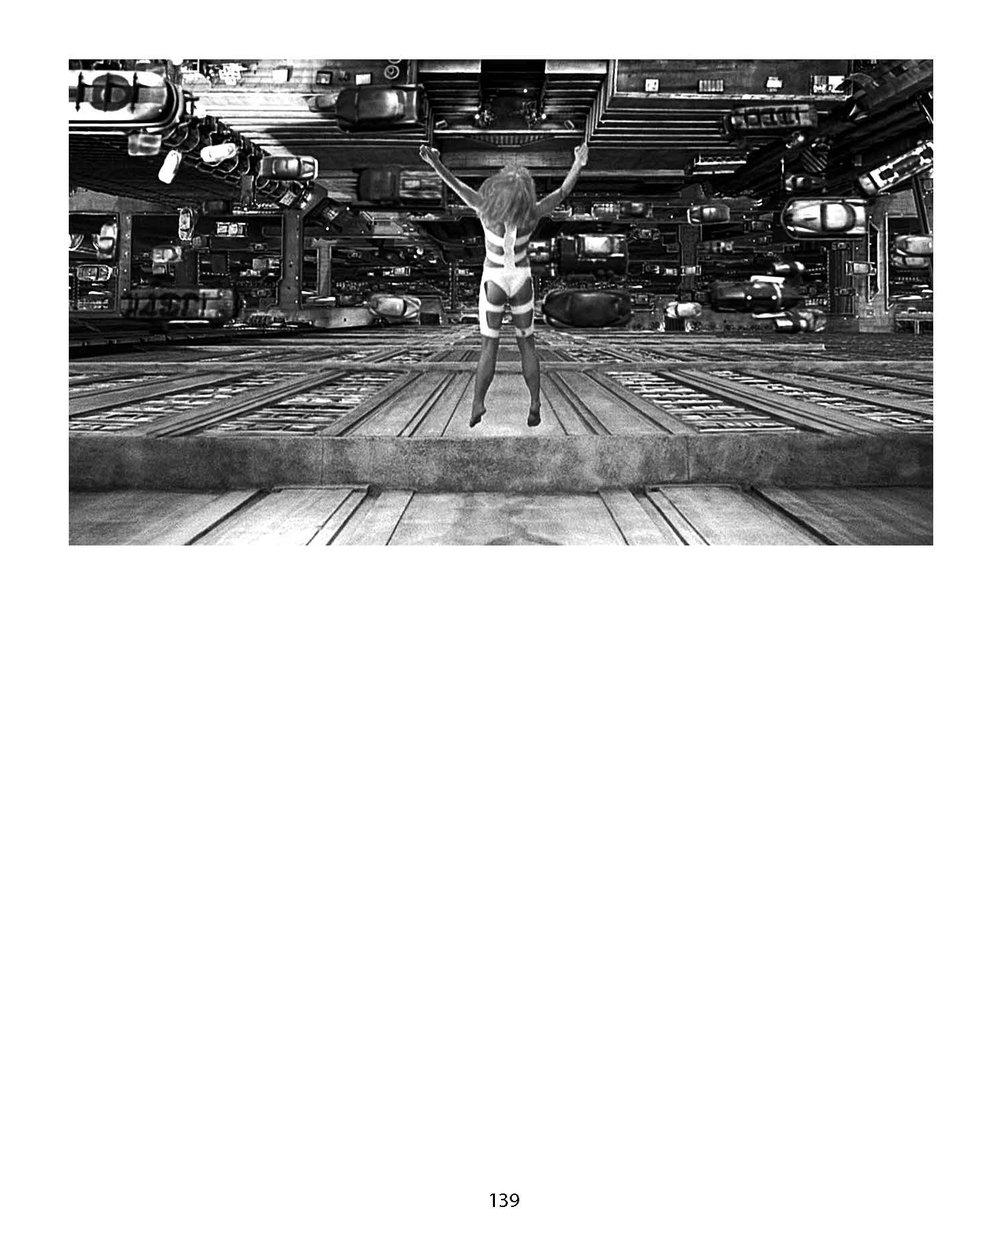 256_Final_Page_139.jpg